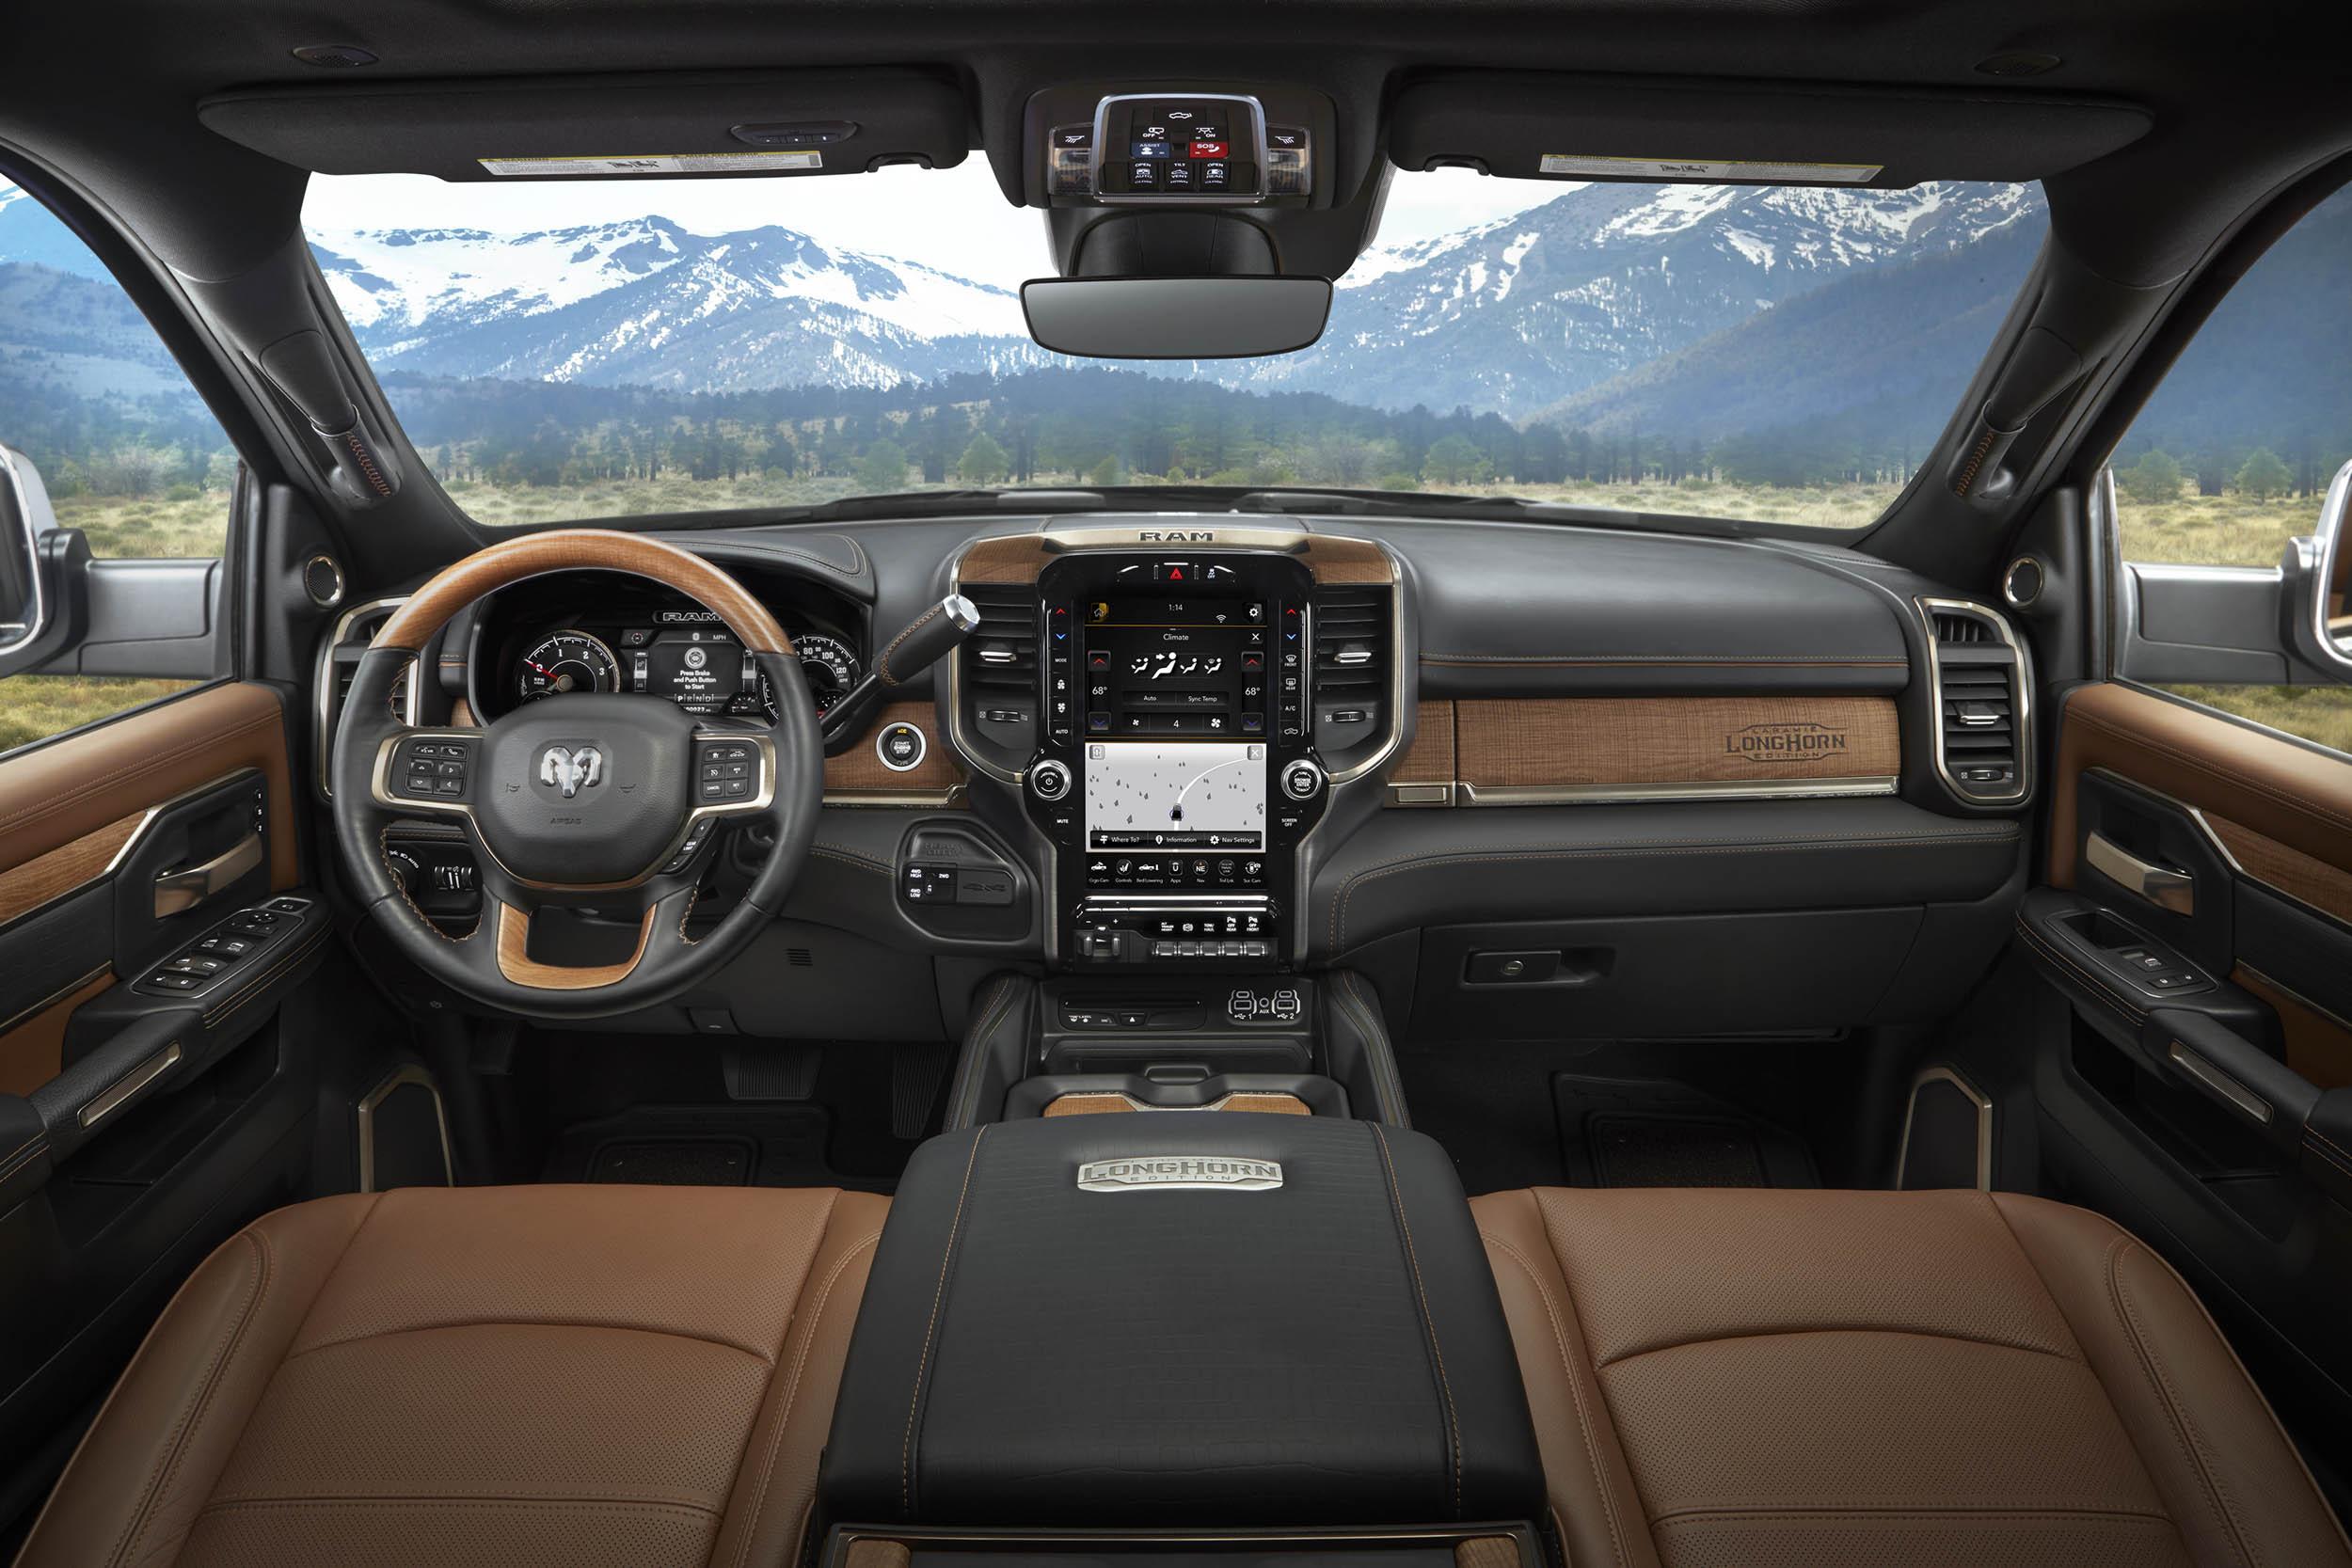 2019 RAM 2500 LongHorn interior